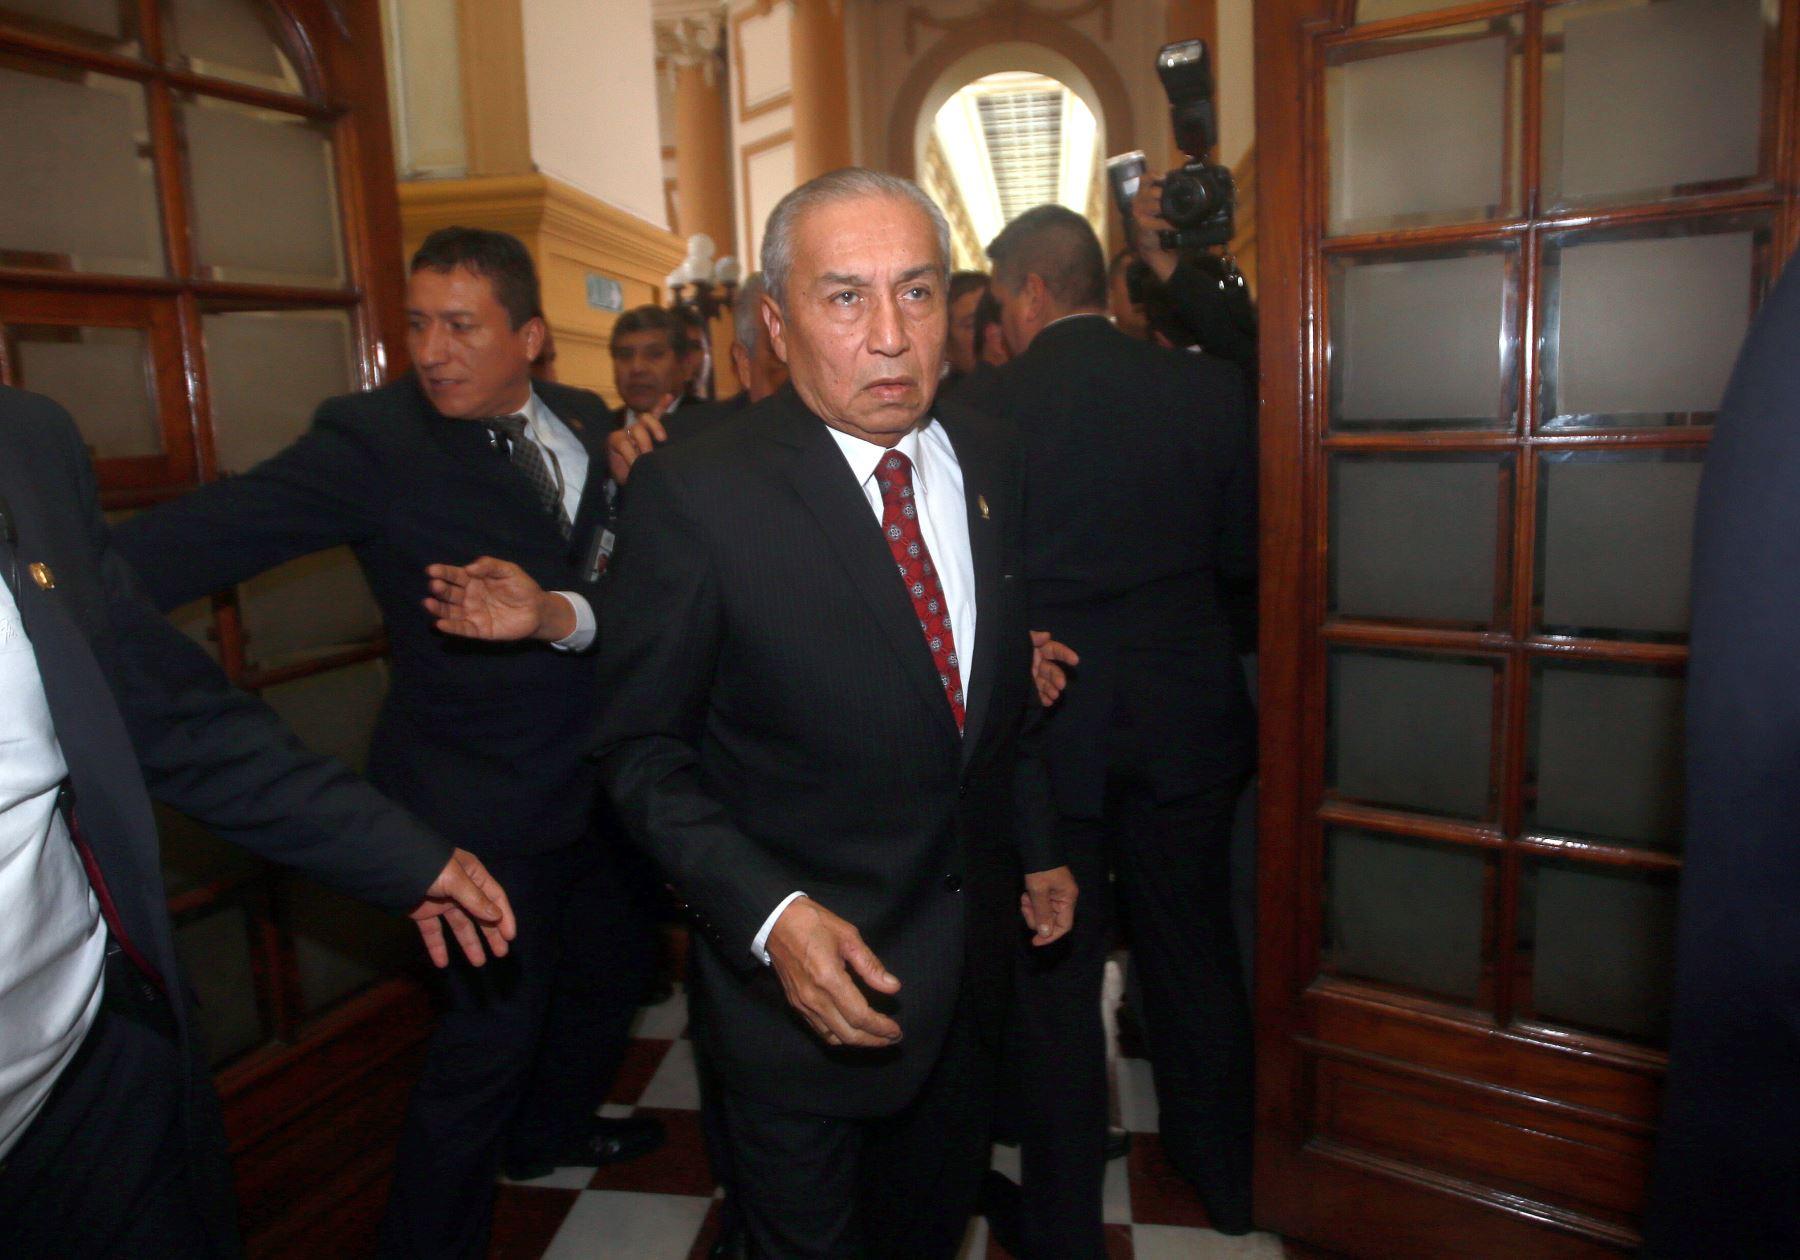 Recomiendan destitución de Pedro Chávarry e inhabilitación por 10 años